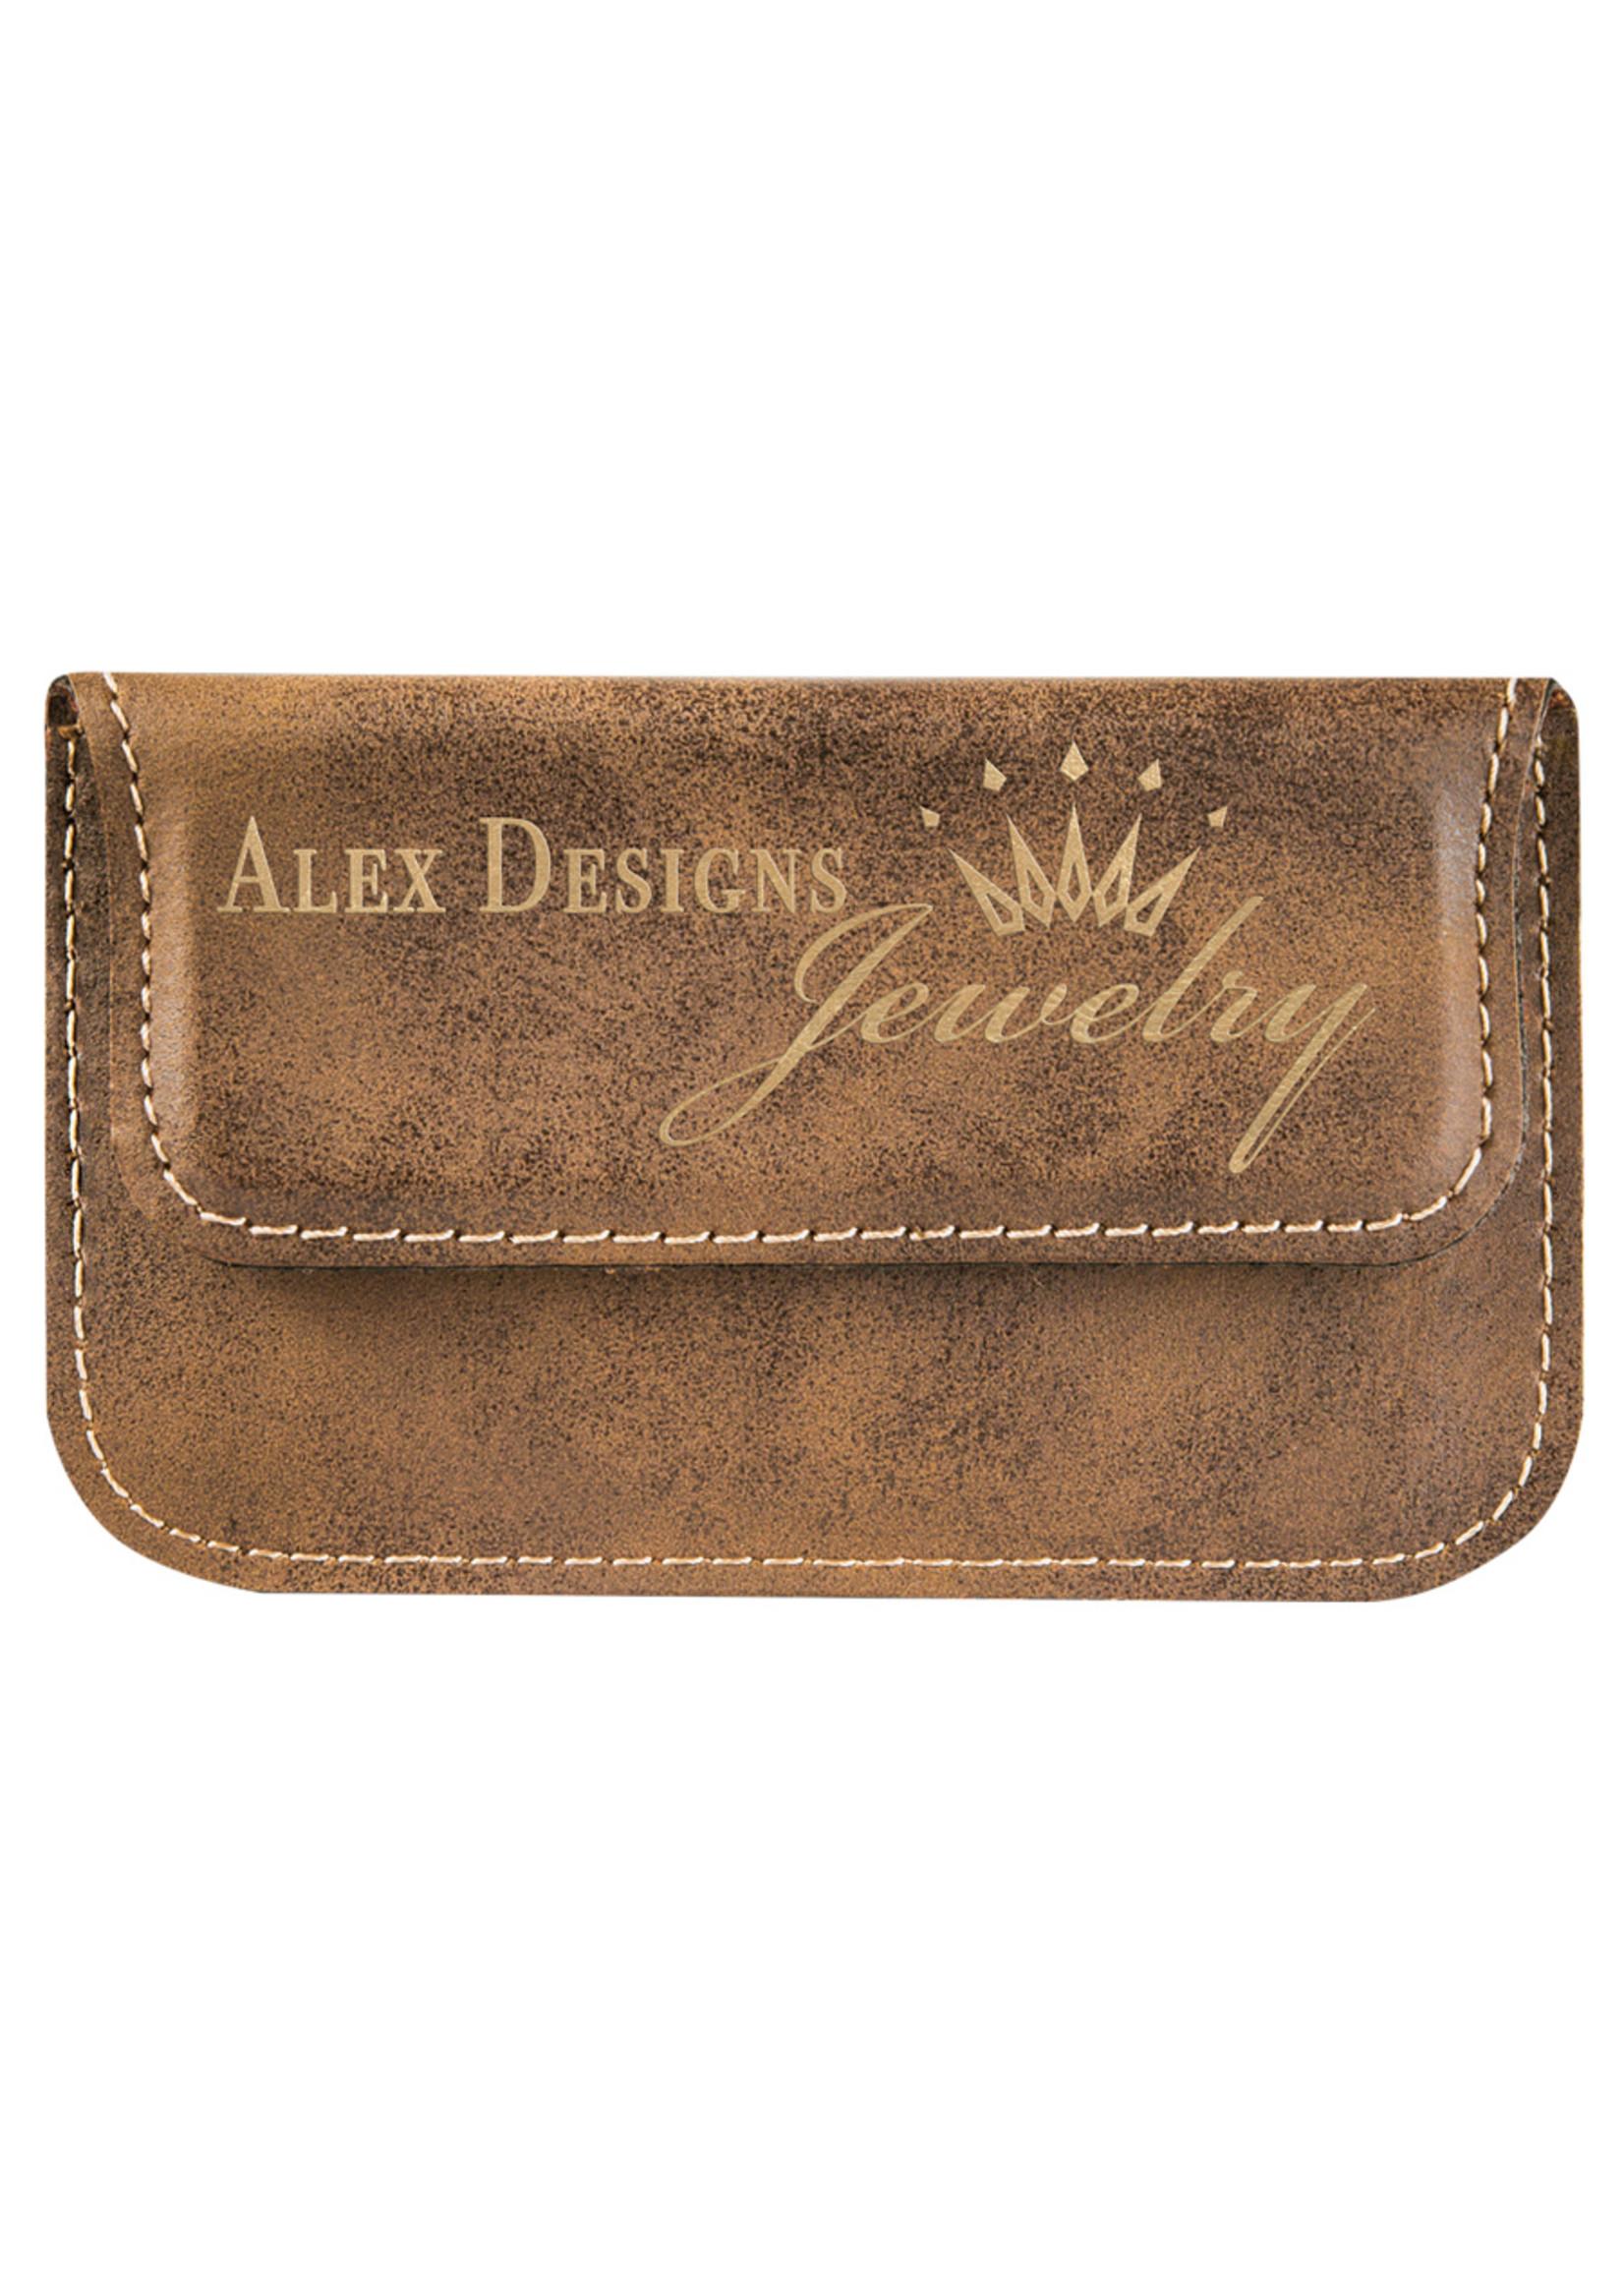 Leatherette Business Card Holder Soft